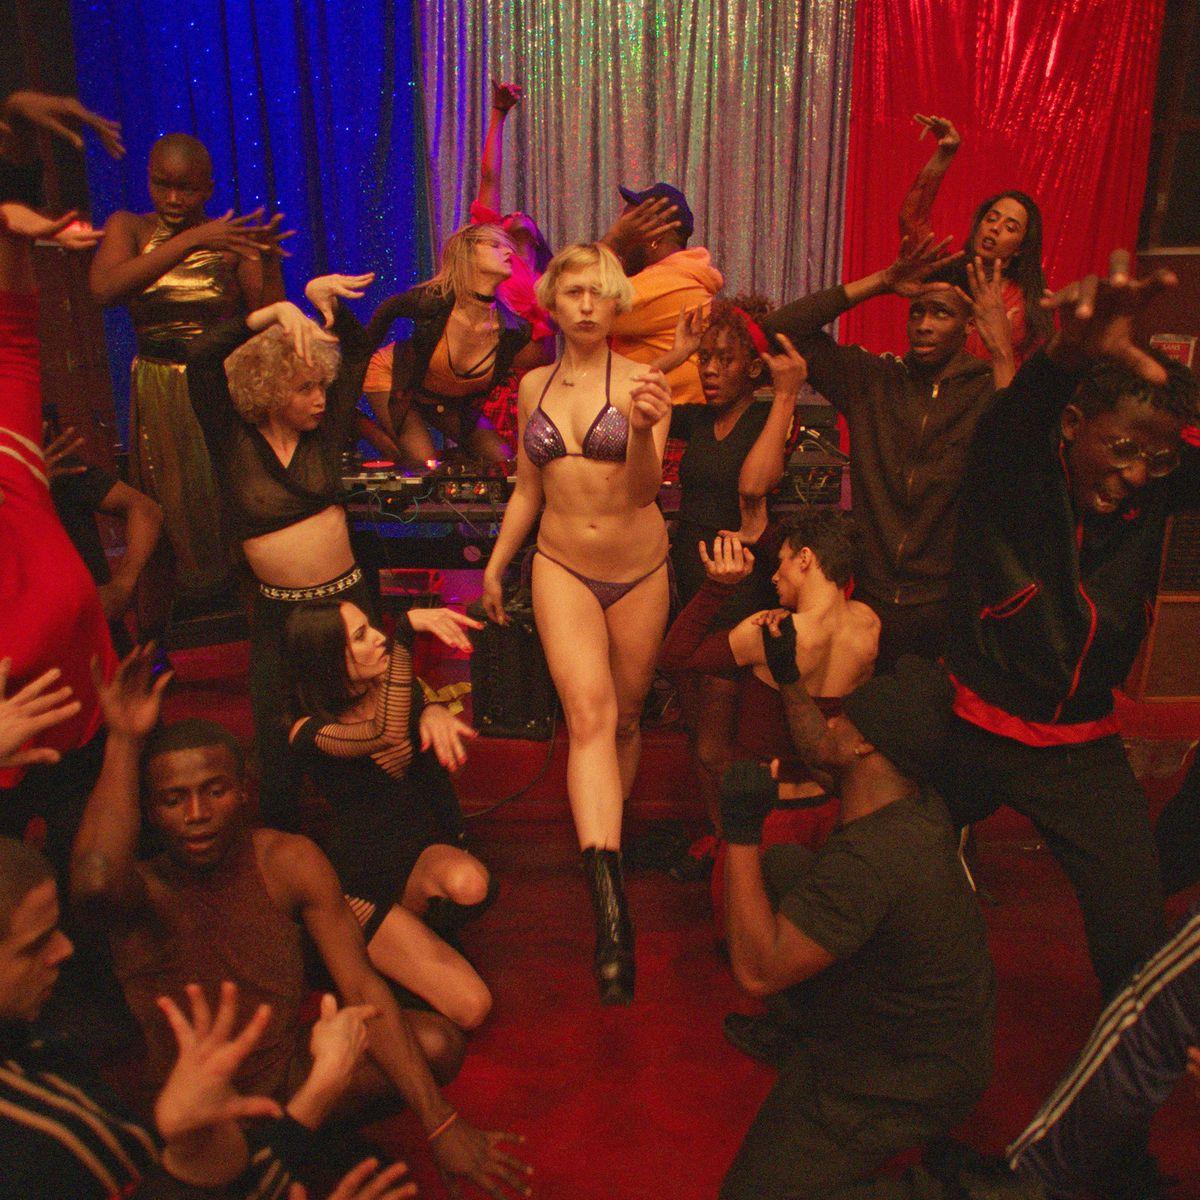 A Sex Odyssey Porn Video gaspar noé on climax, violence, santa claus, and modern porn